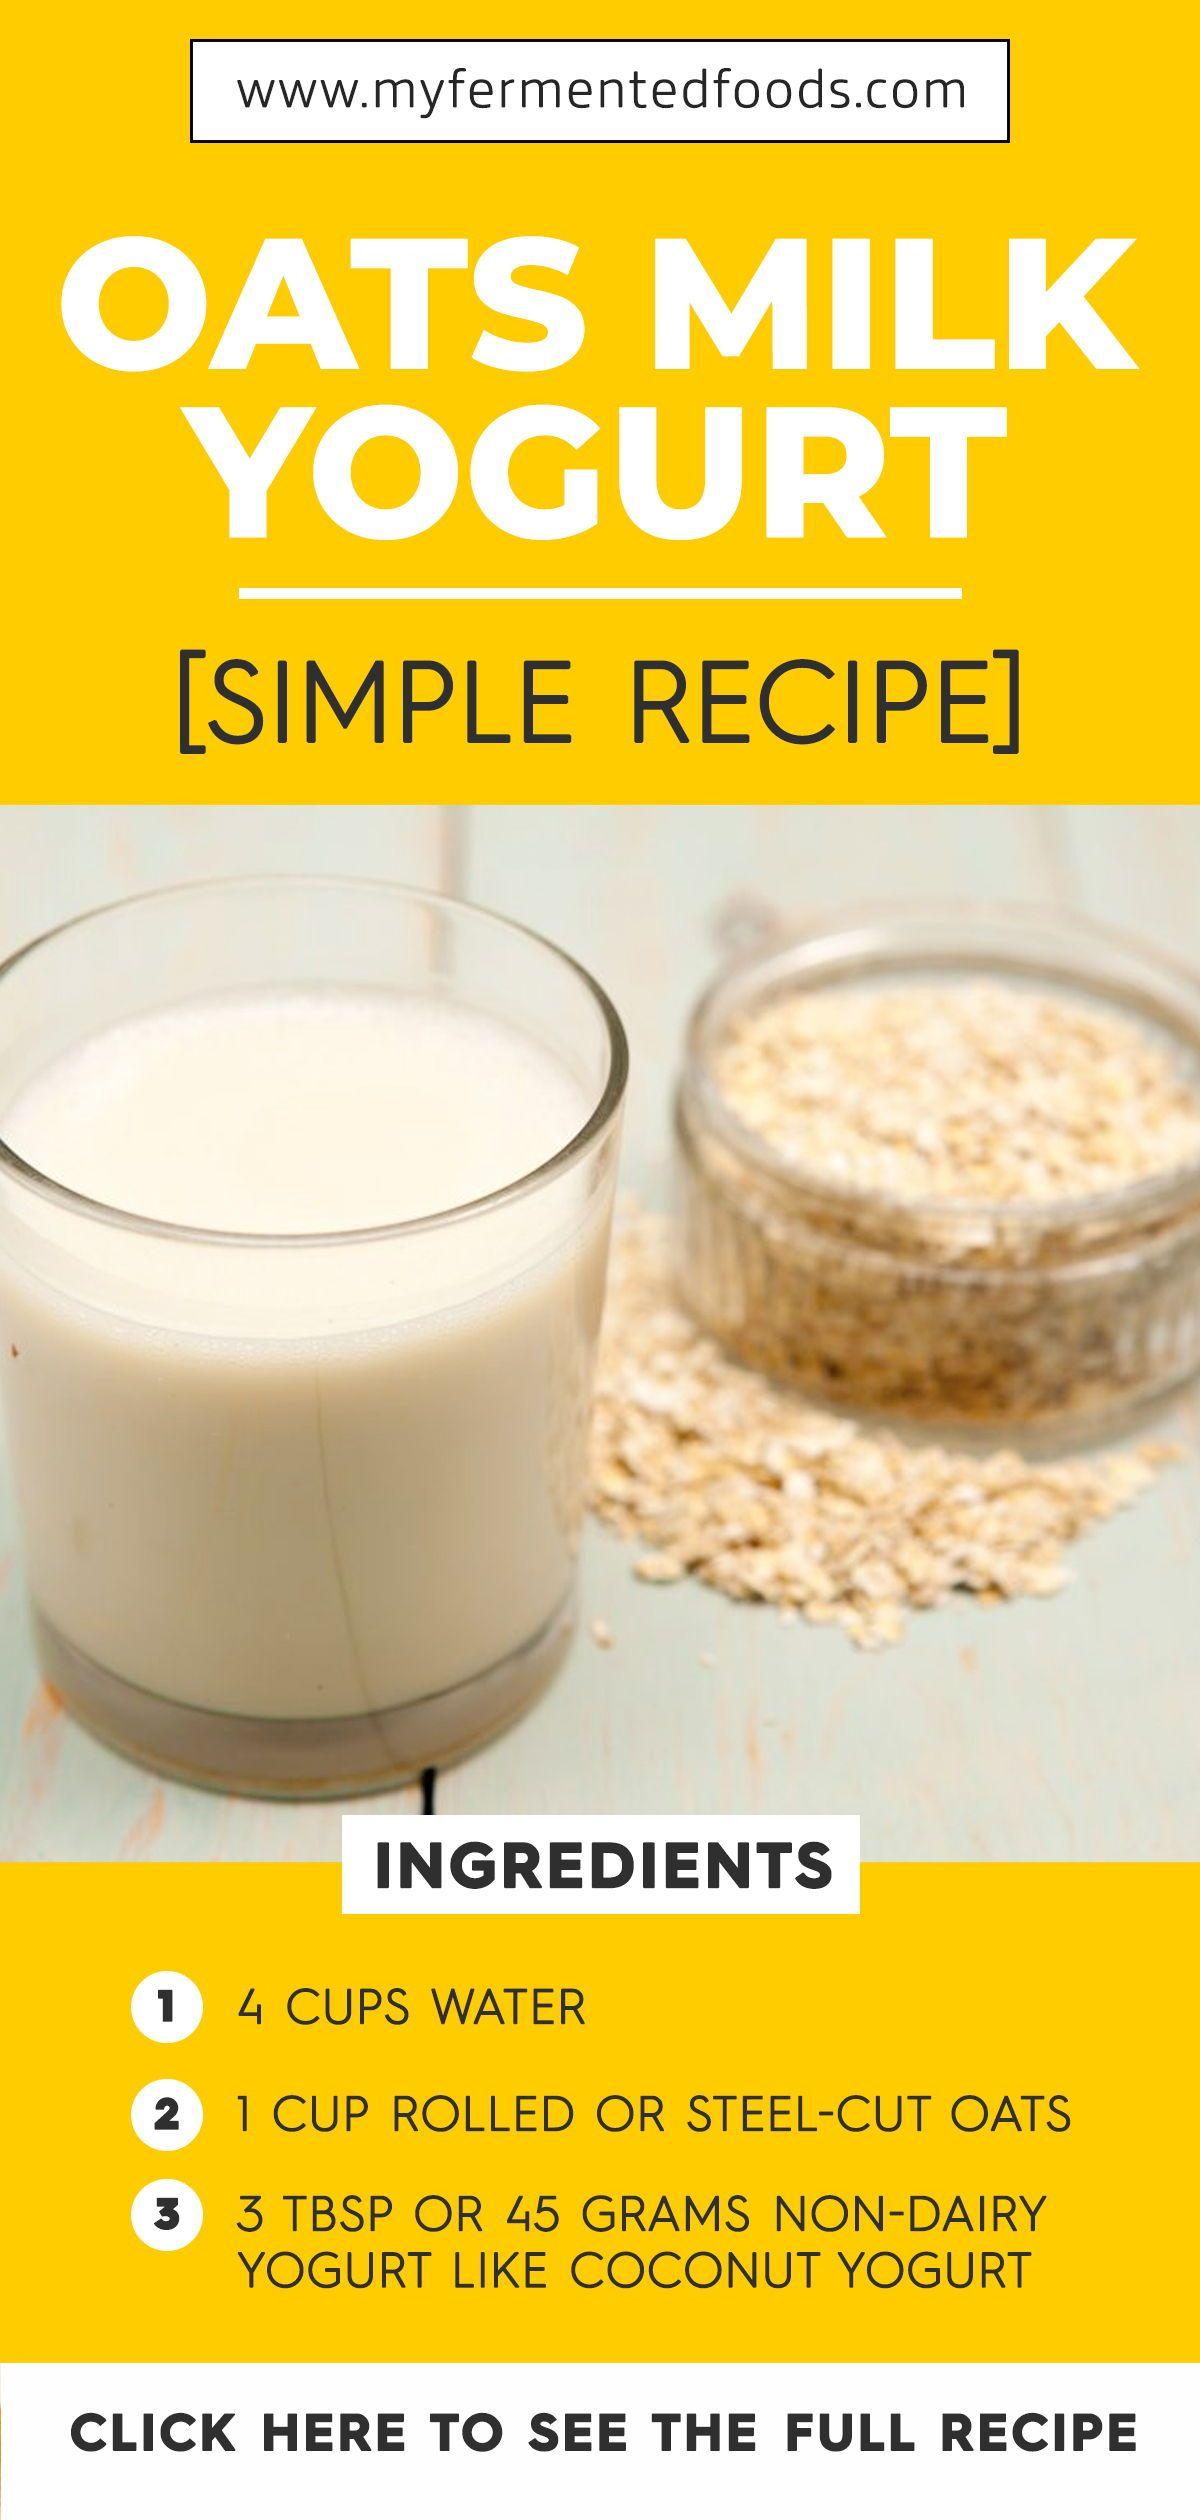 Step By Step Recipe On How To Make Oats Milk Yogurt Myfermentedfoods Yogurt Yogurtlover Recipe Homemade Fermented Yogurt Recipes Fermented Foods Oat Milk